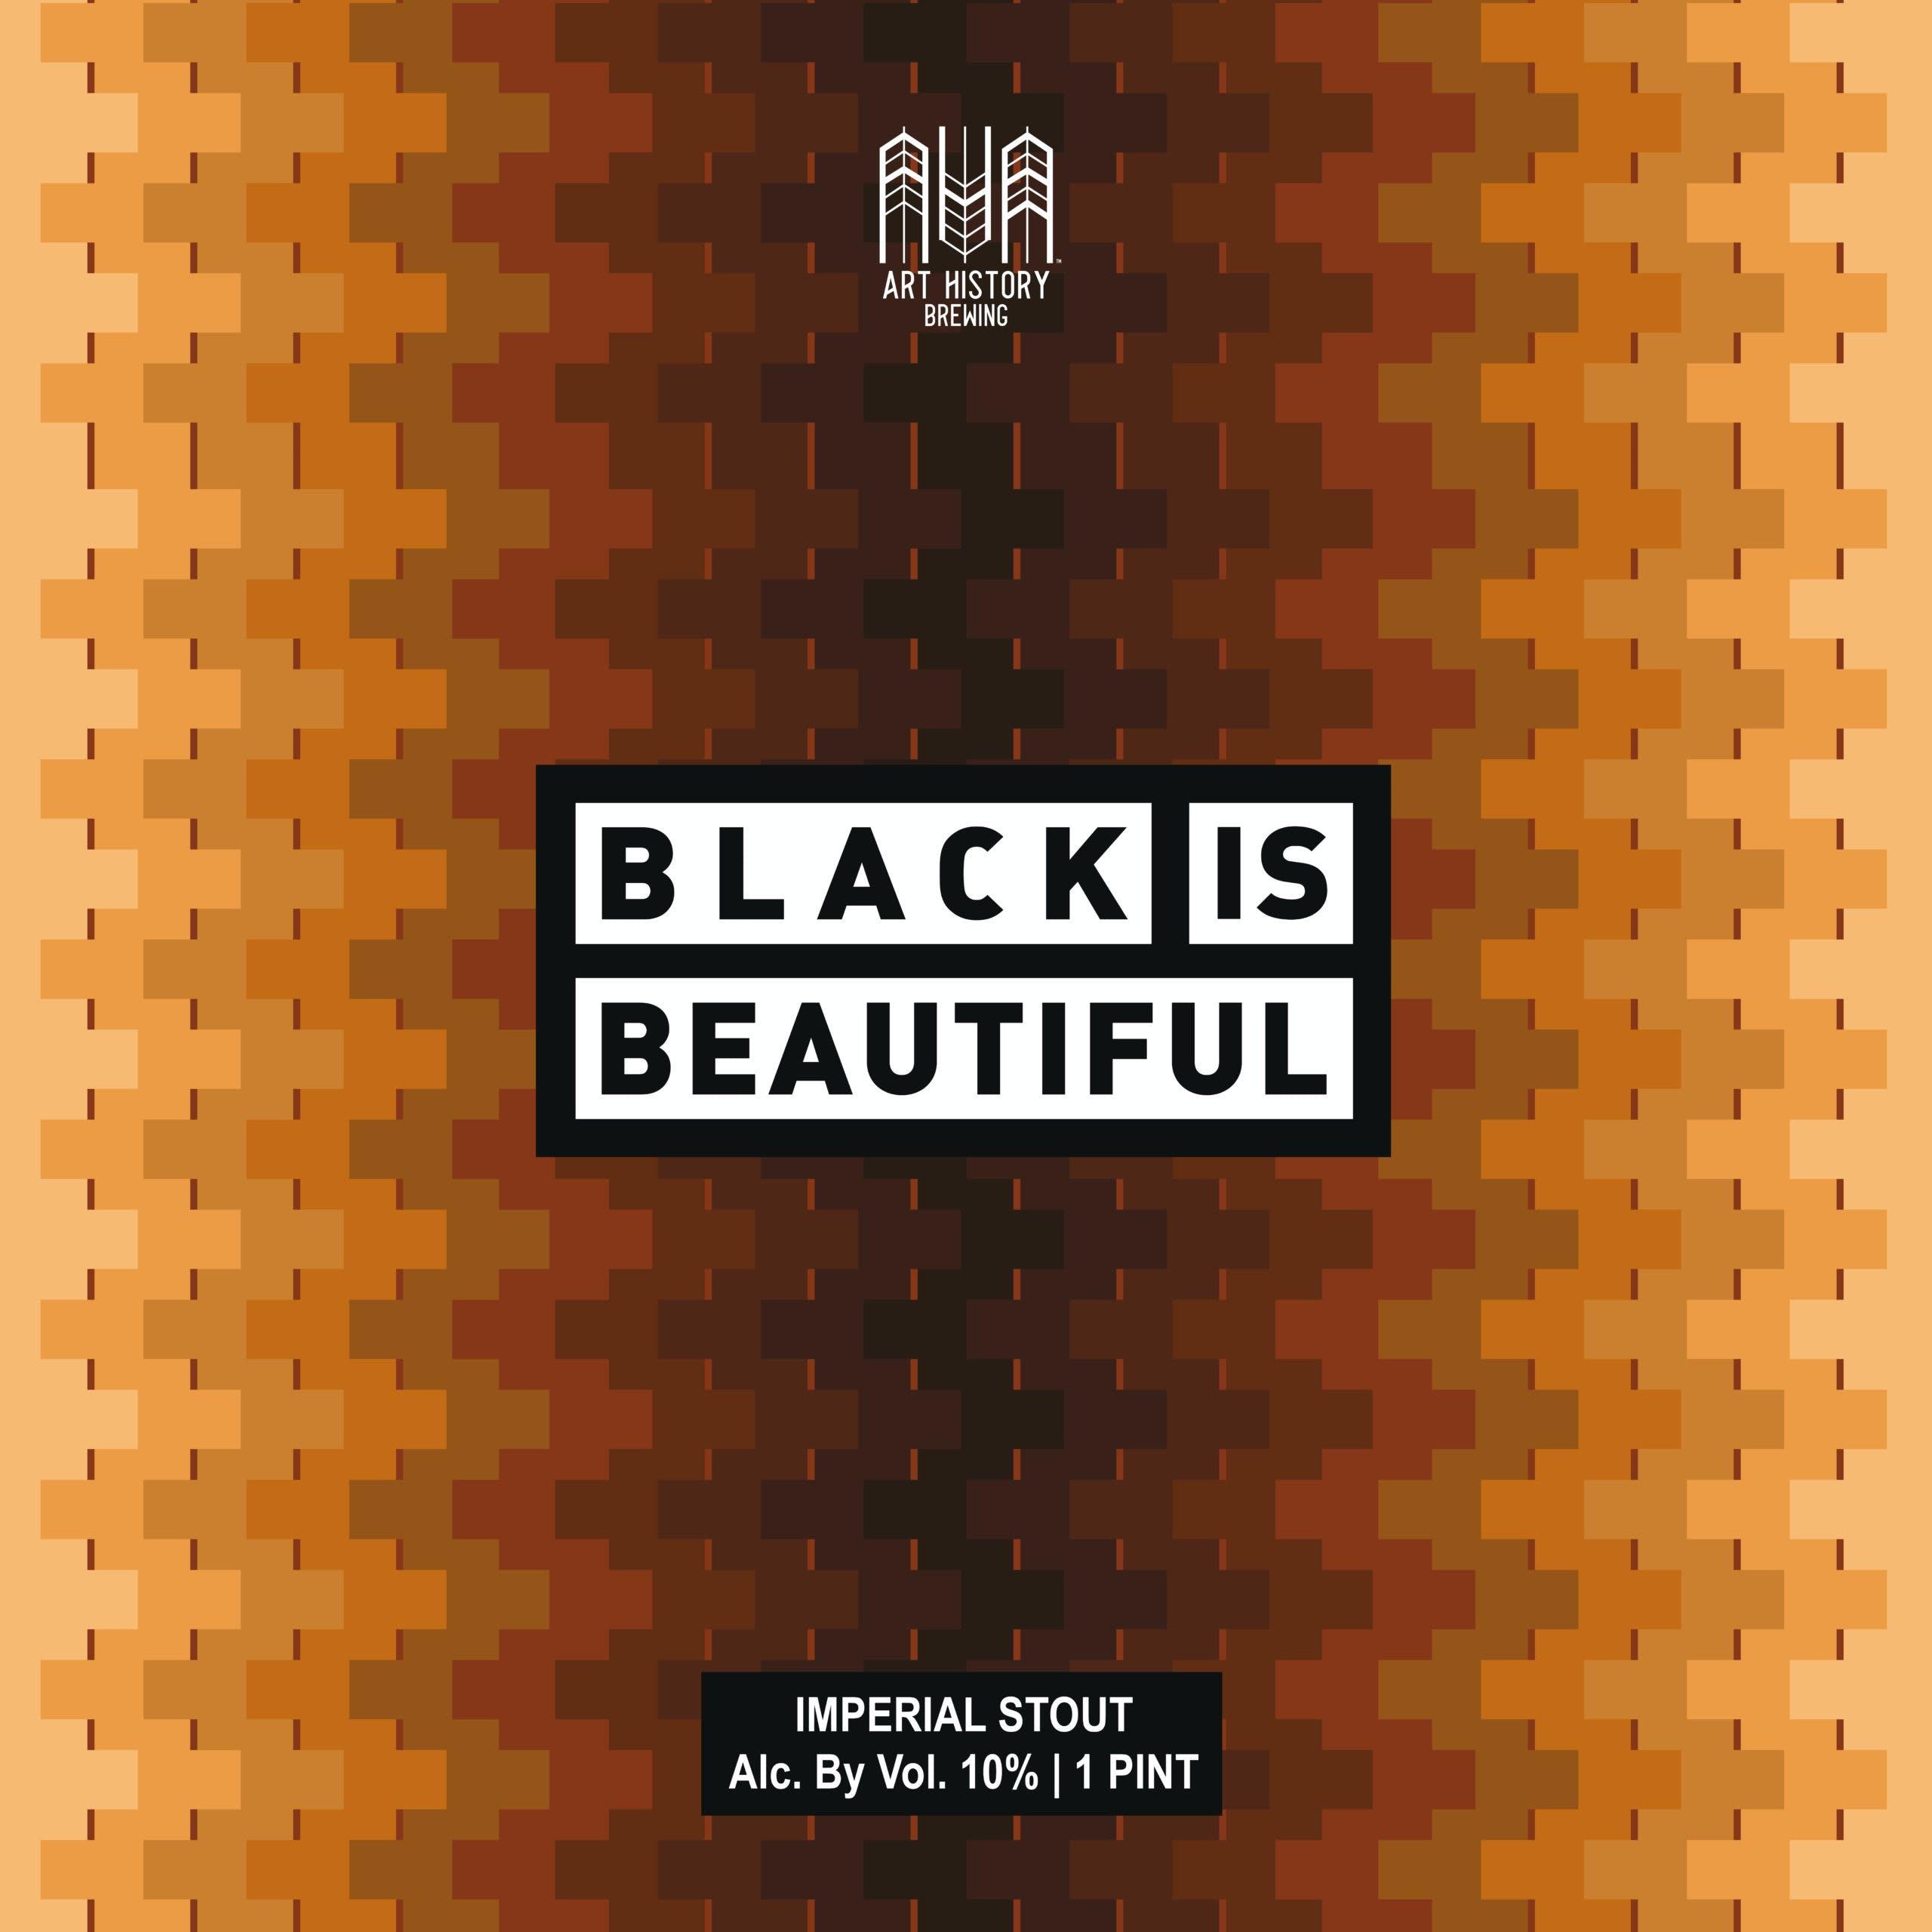 poster-blackisbeautiful-01